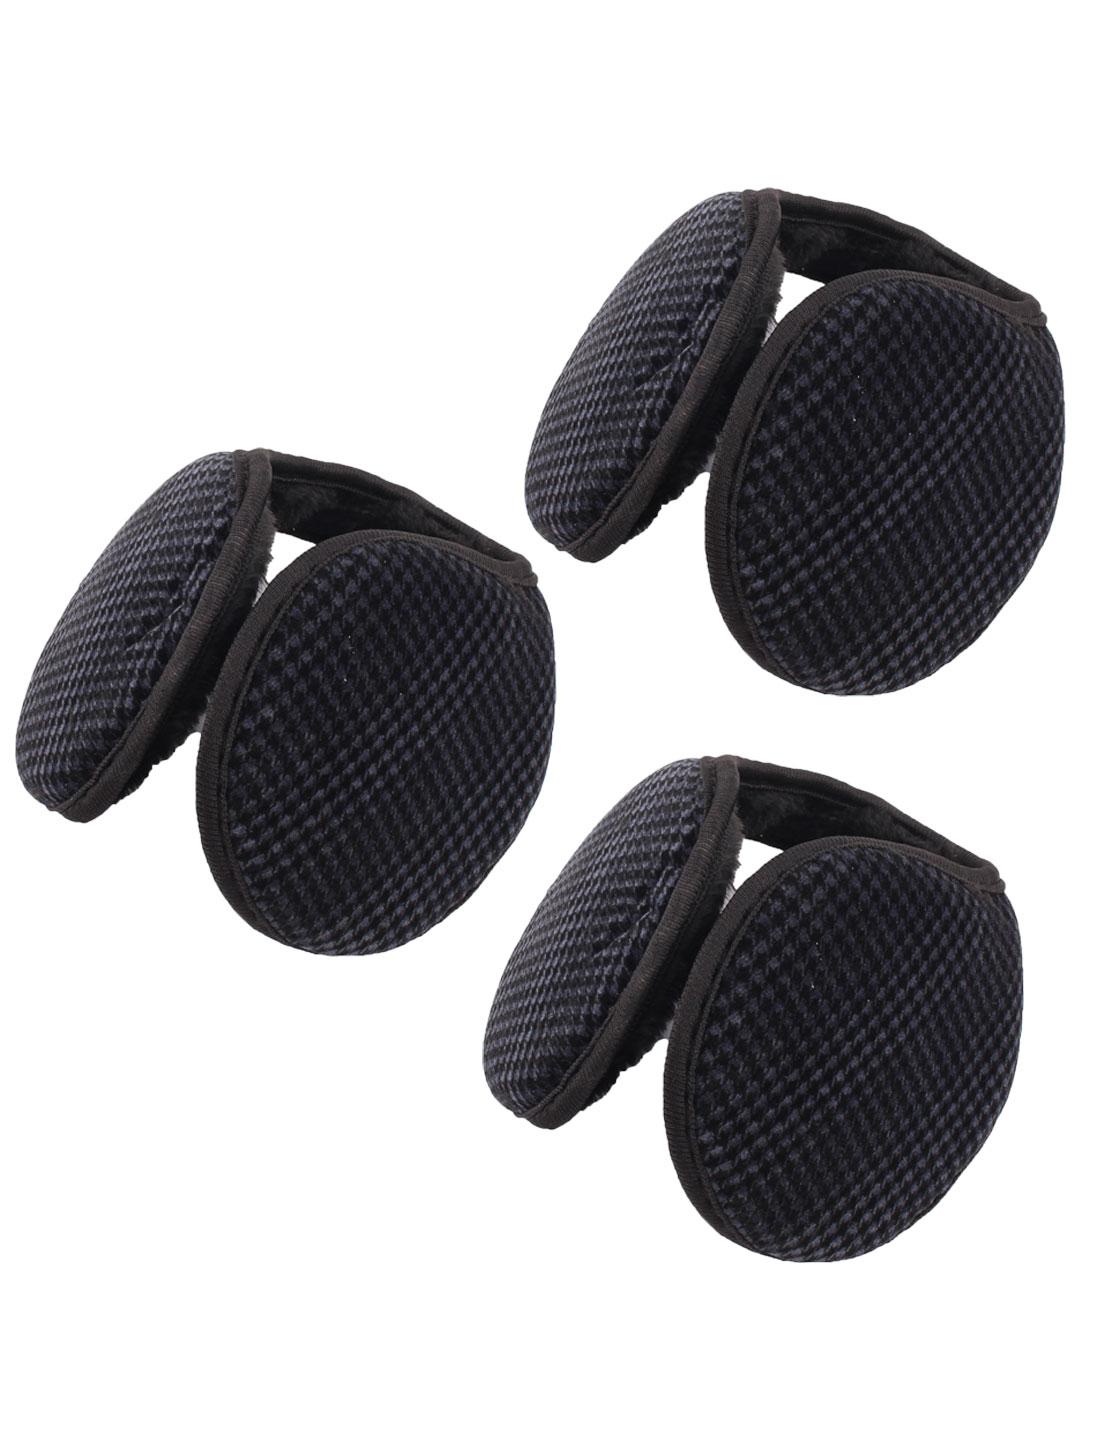 Man Metal Frame Plush Winter Headwear Ear Warmer Protector Earmuffs Black 3 Pcs